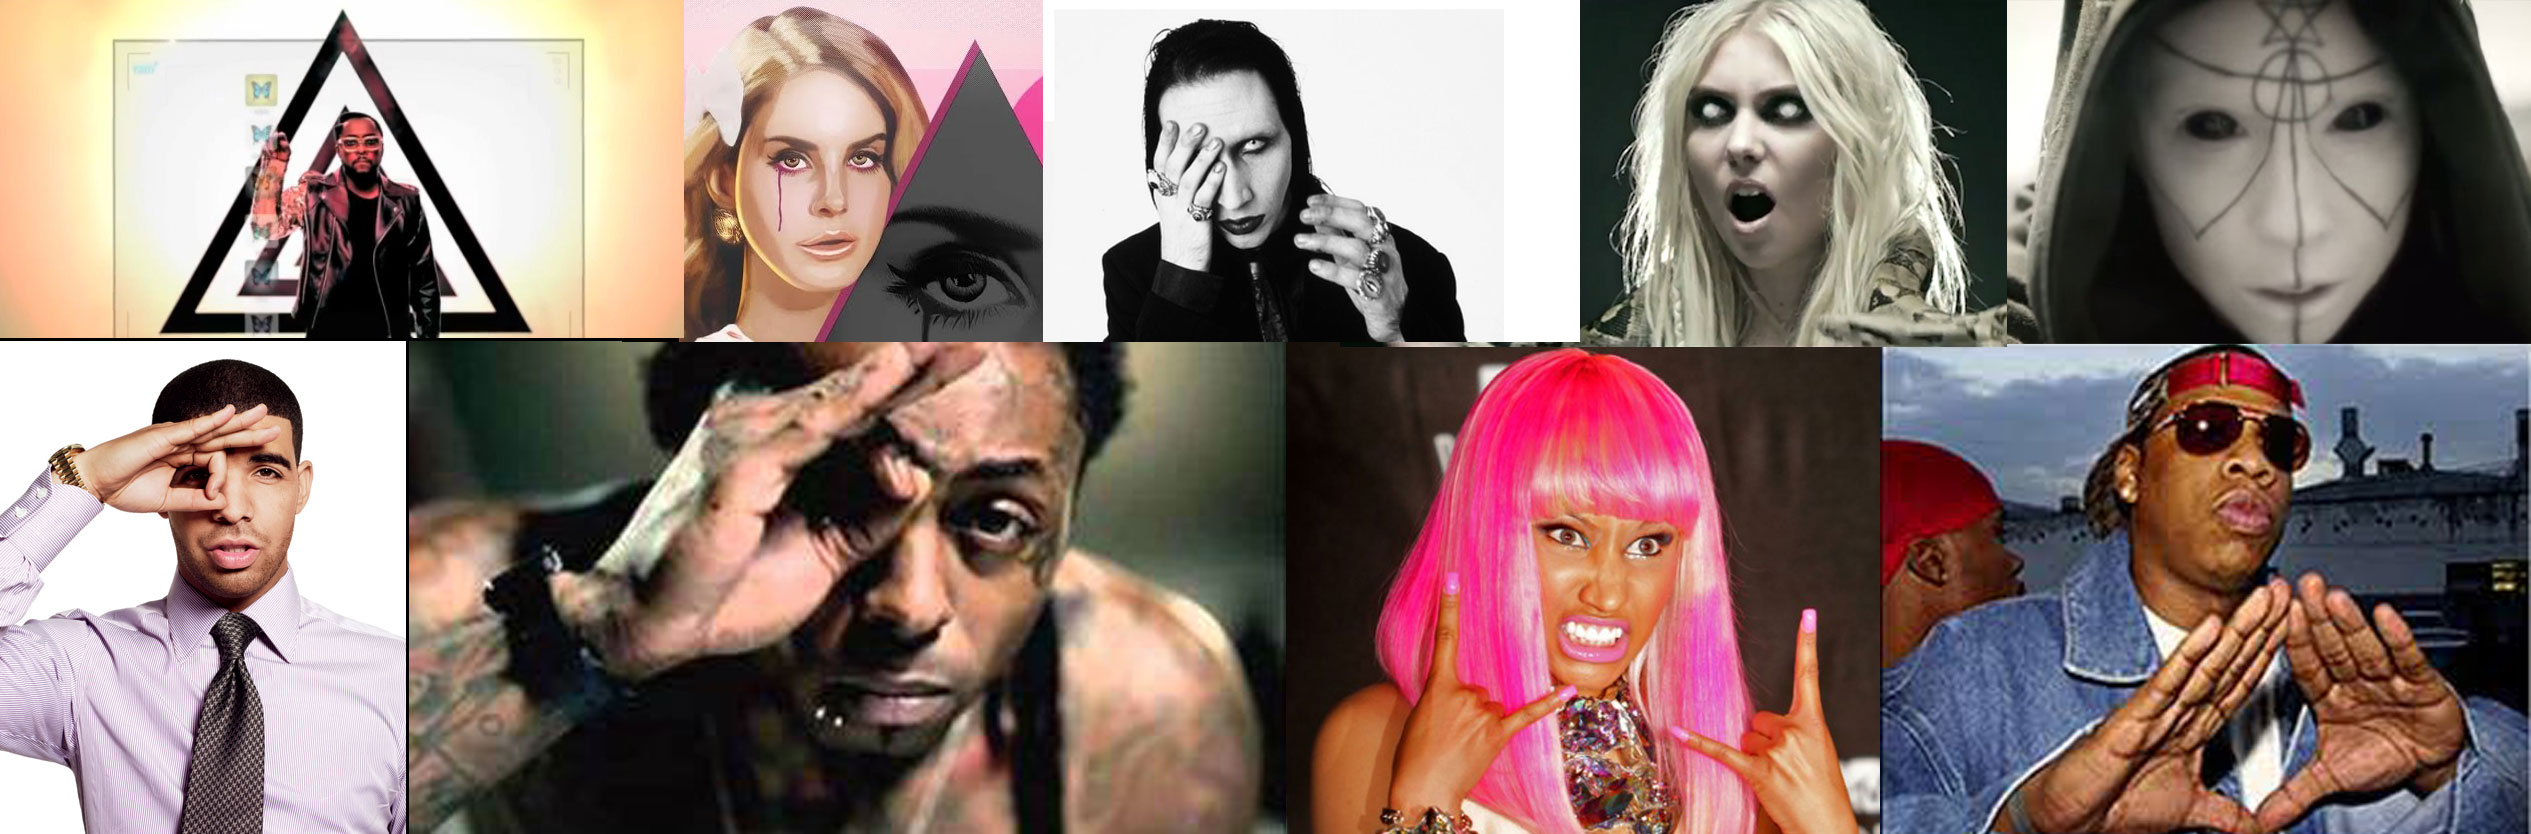 Music Industry Exposed Part 3 Black Magic And Dark Hidden